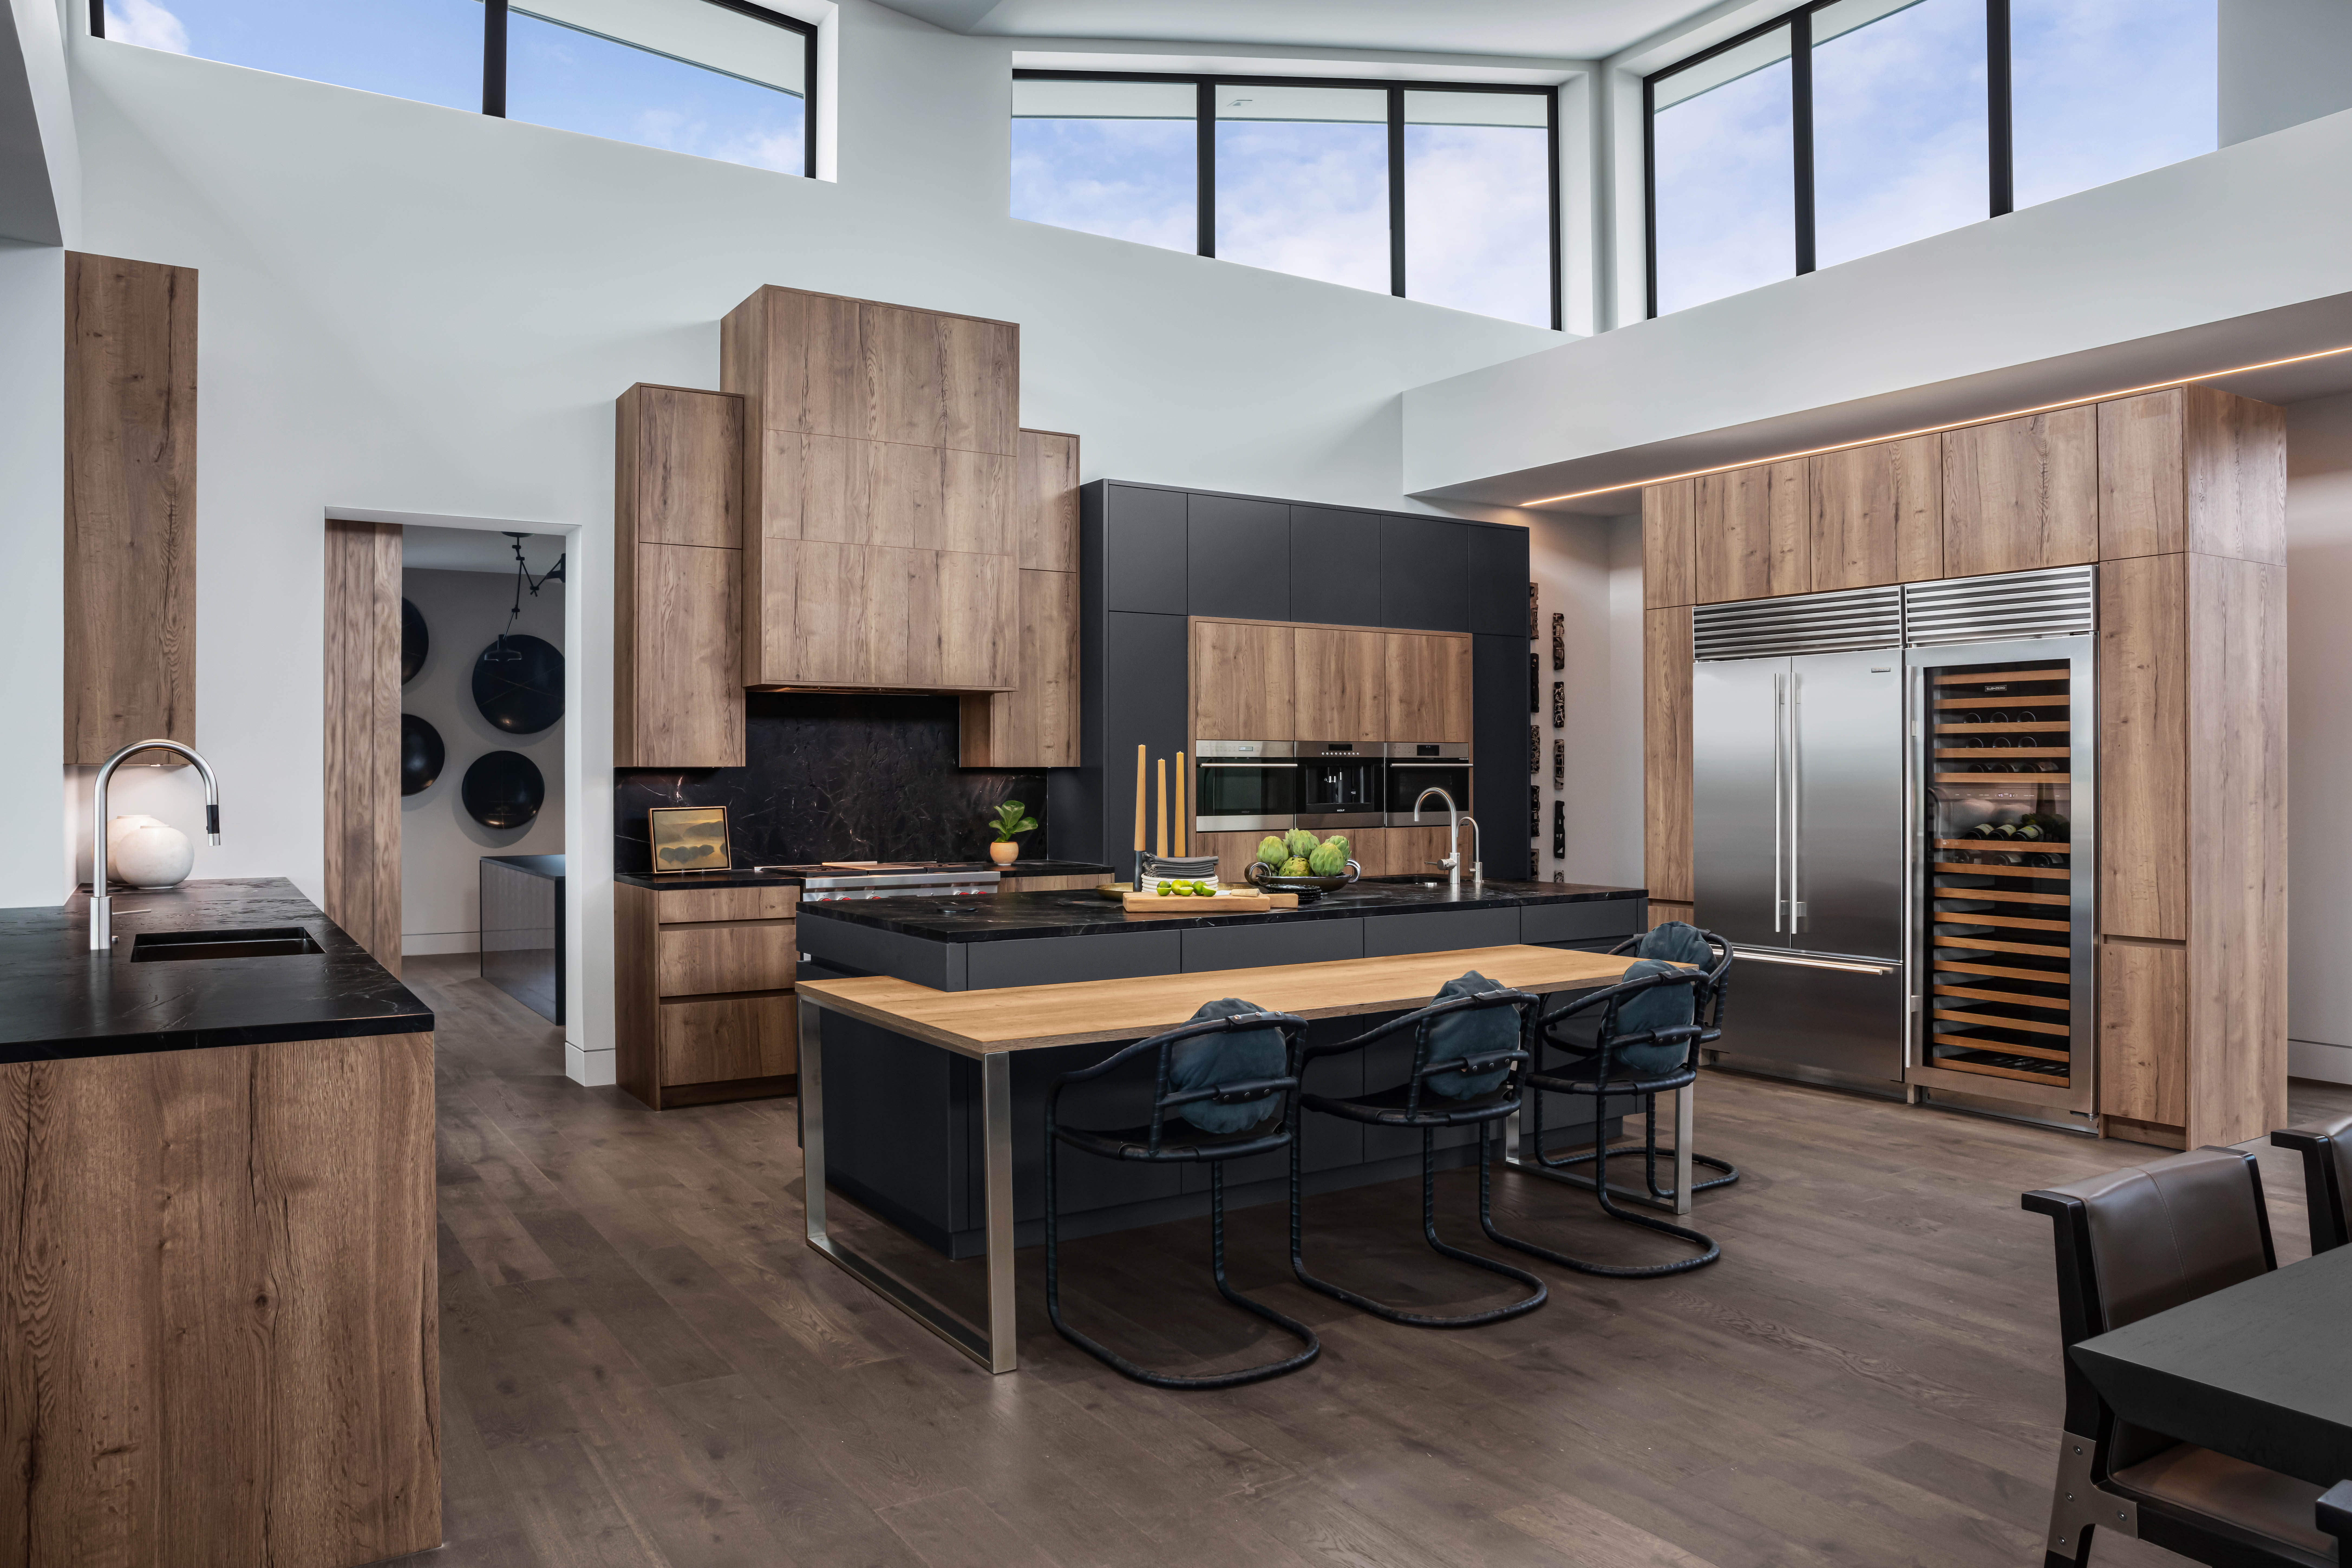 Blue Grass Kitchen Overall